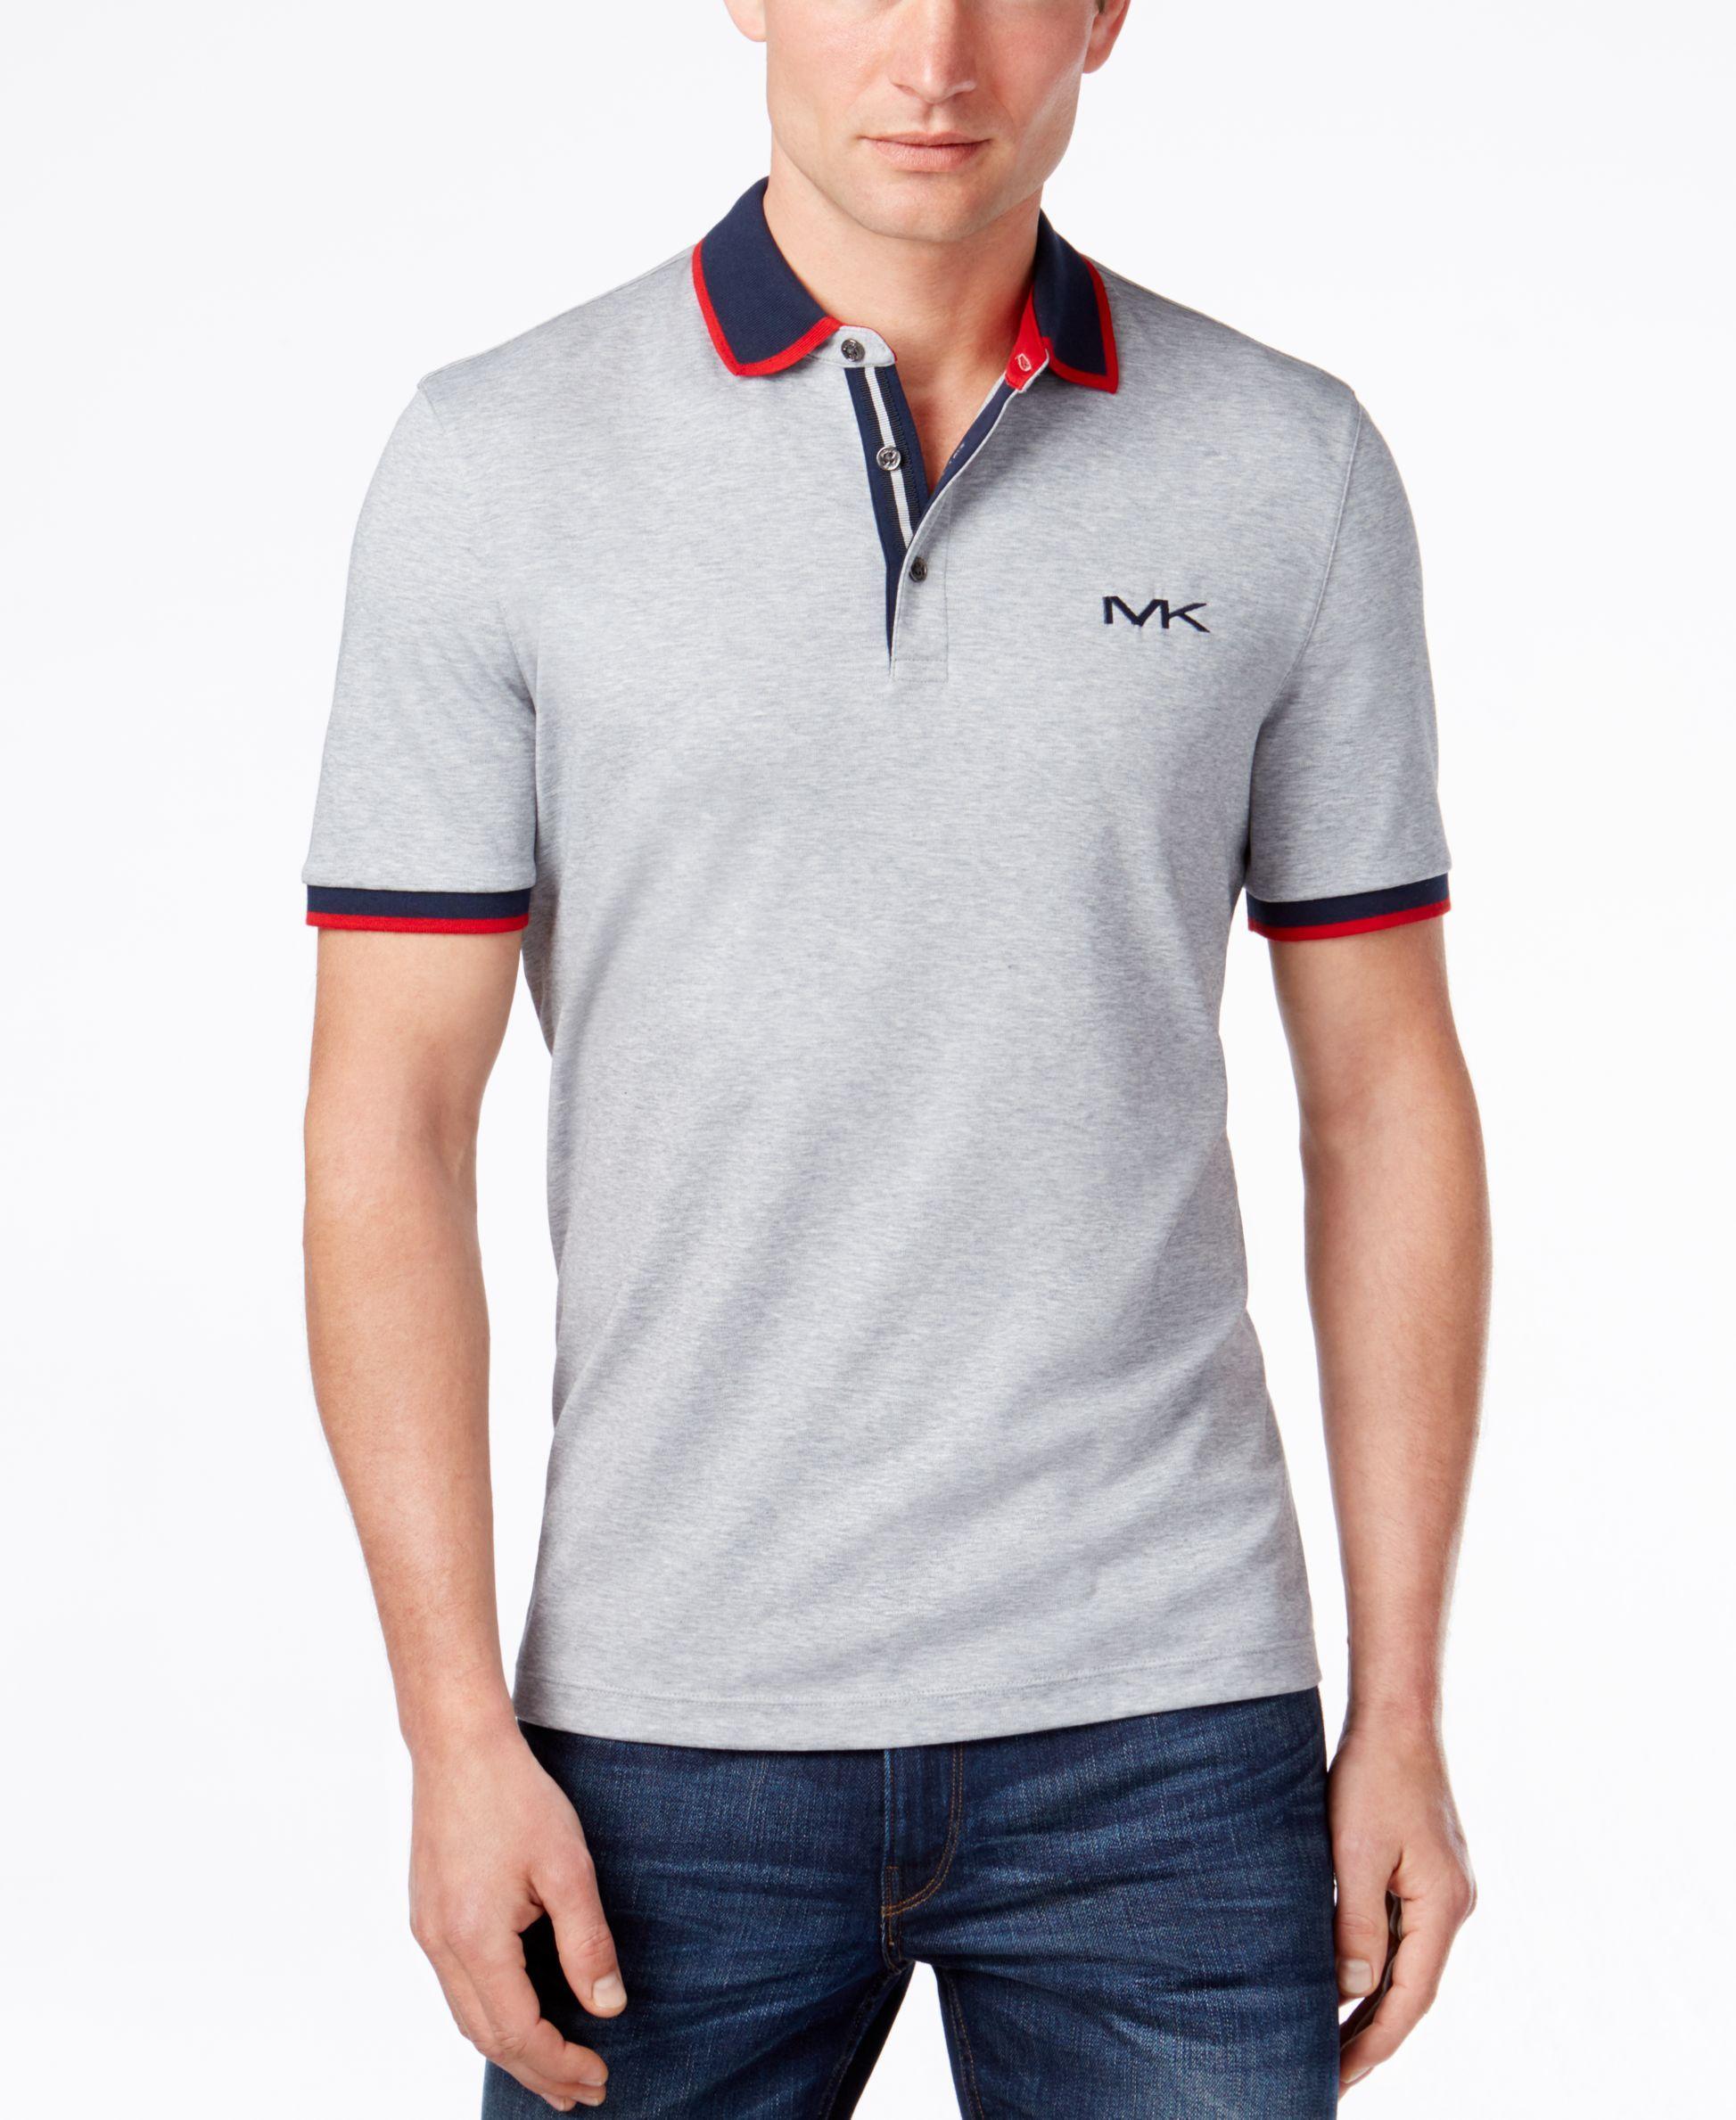 racing fashion logo designers women graphic car pin apparel fashionable benz talented t tshirts shirts creative mercedes amg s shirt vertical by